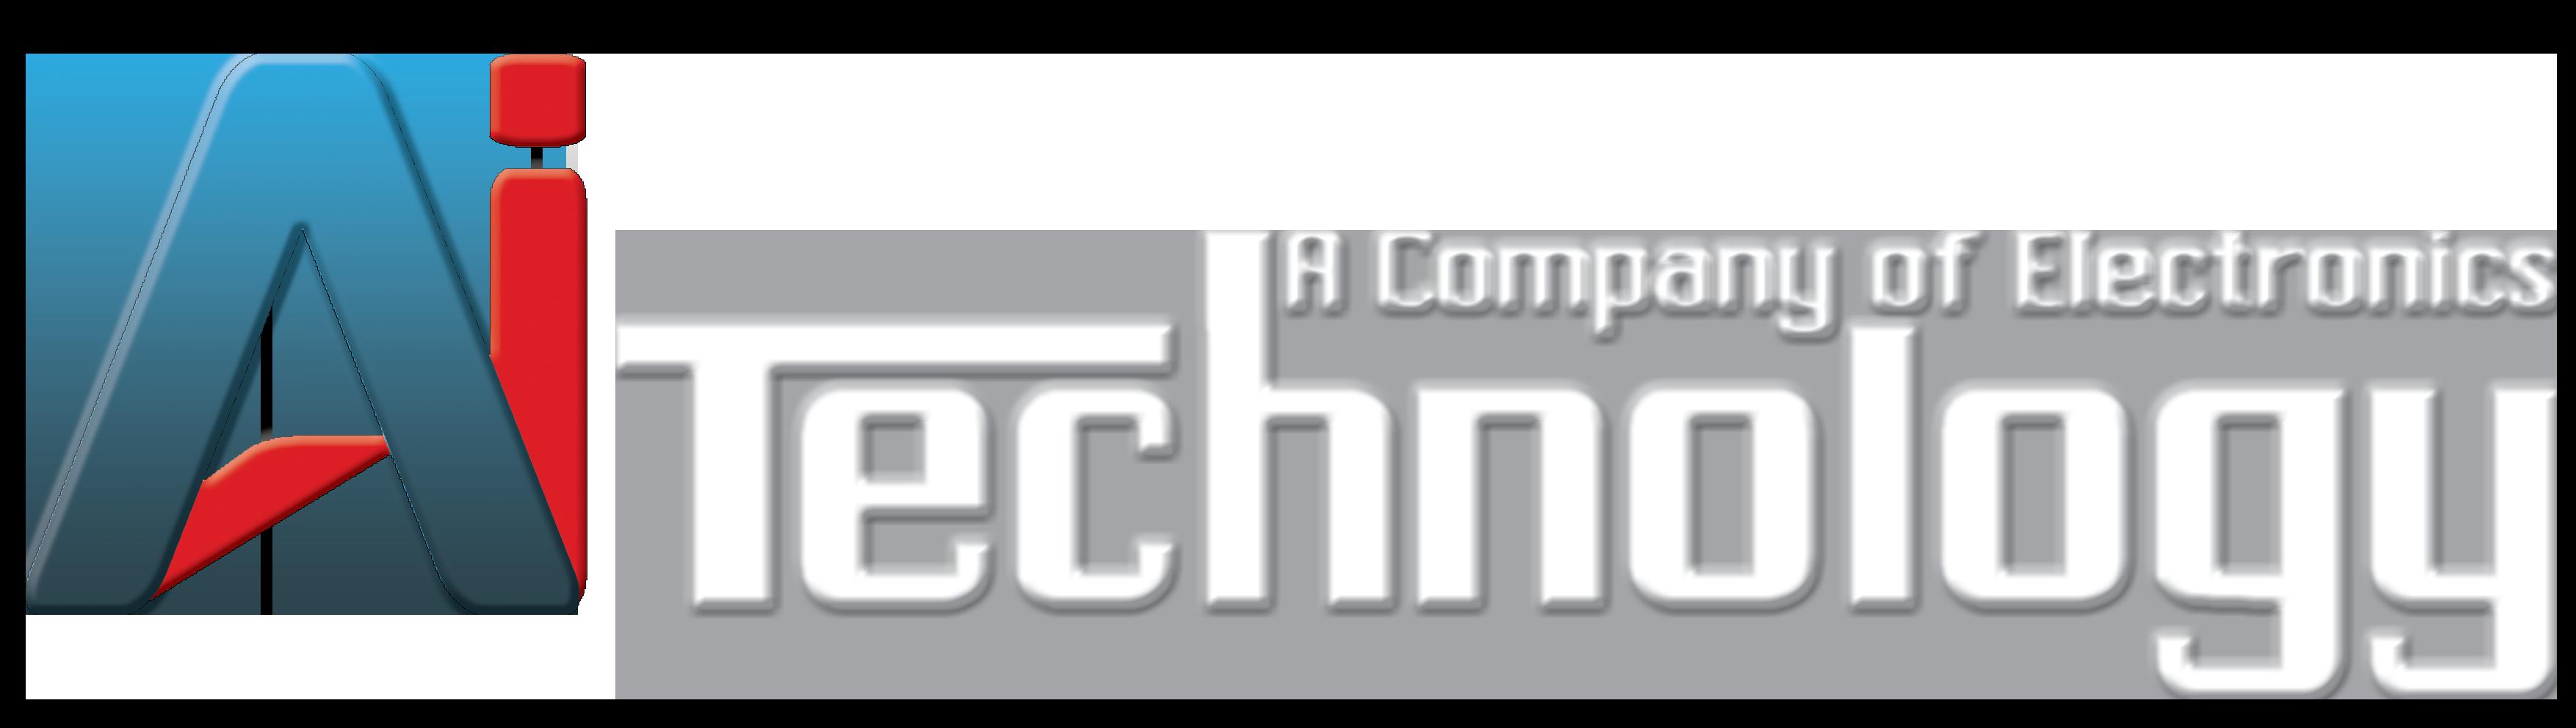 AiTech.bg - офис поддръжка и сервиз